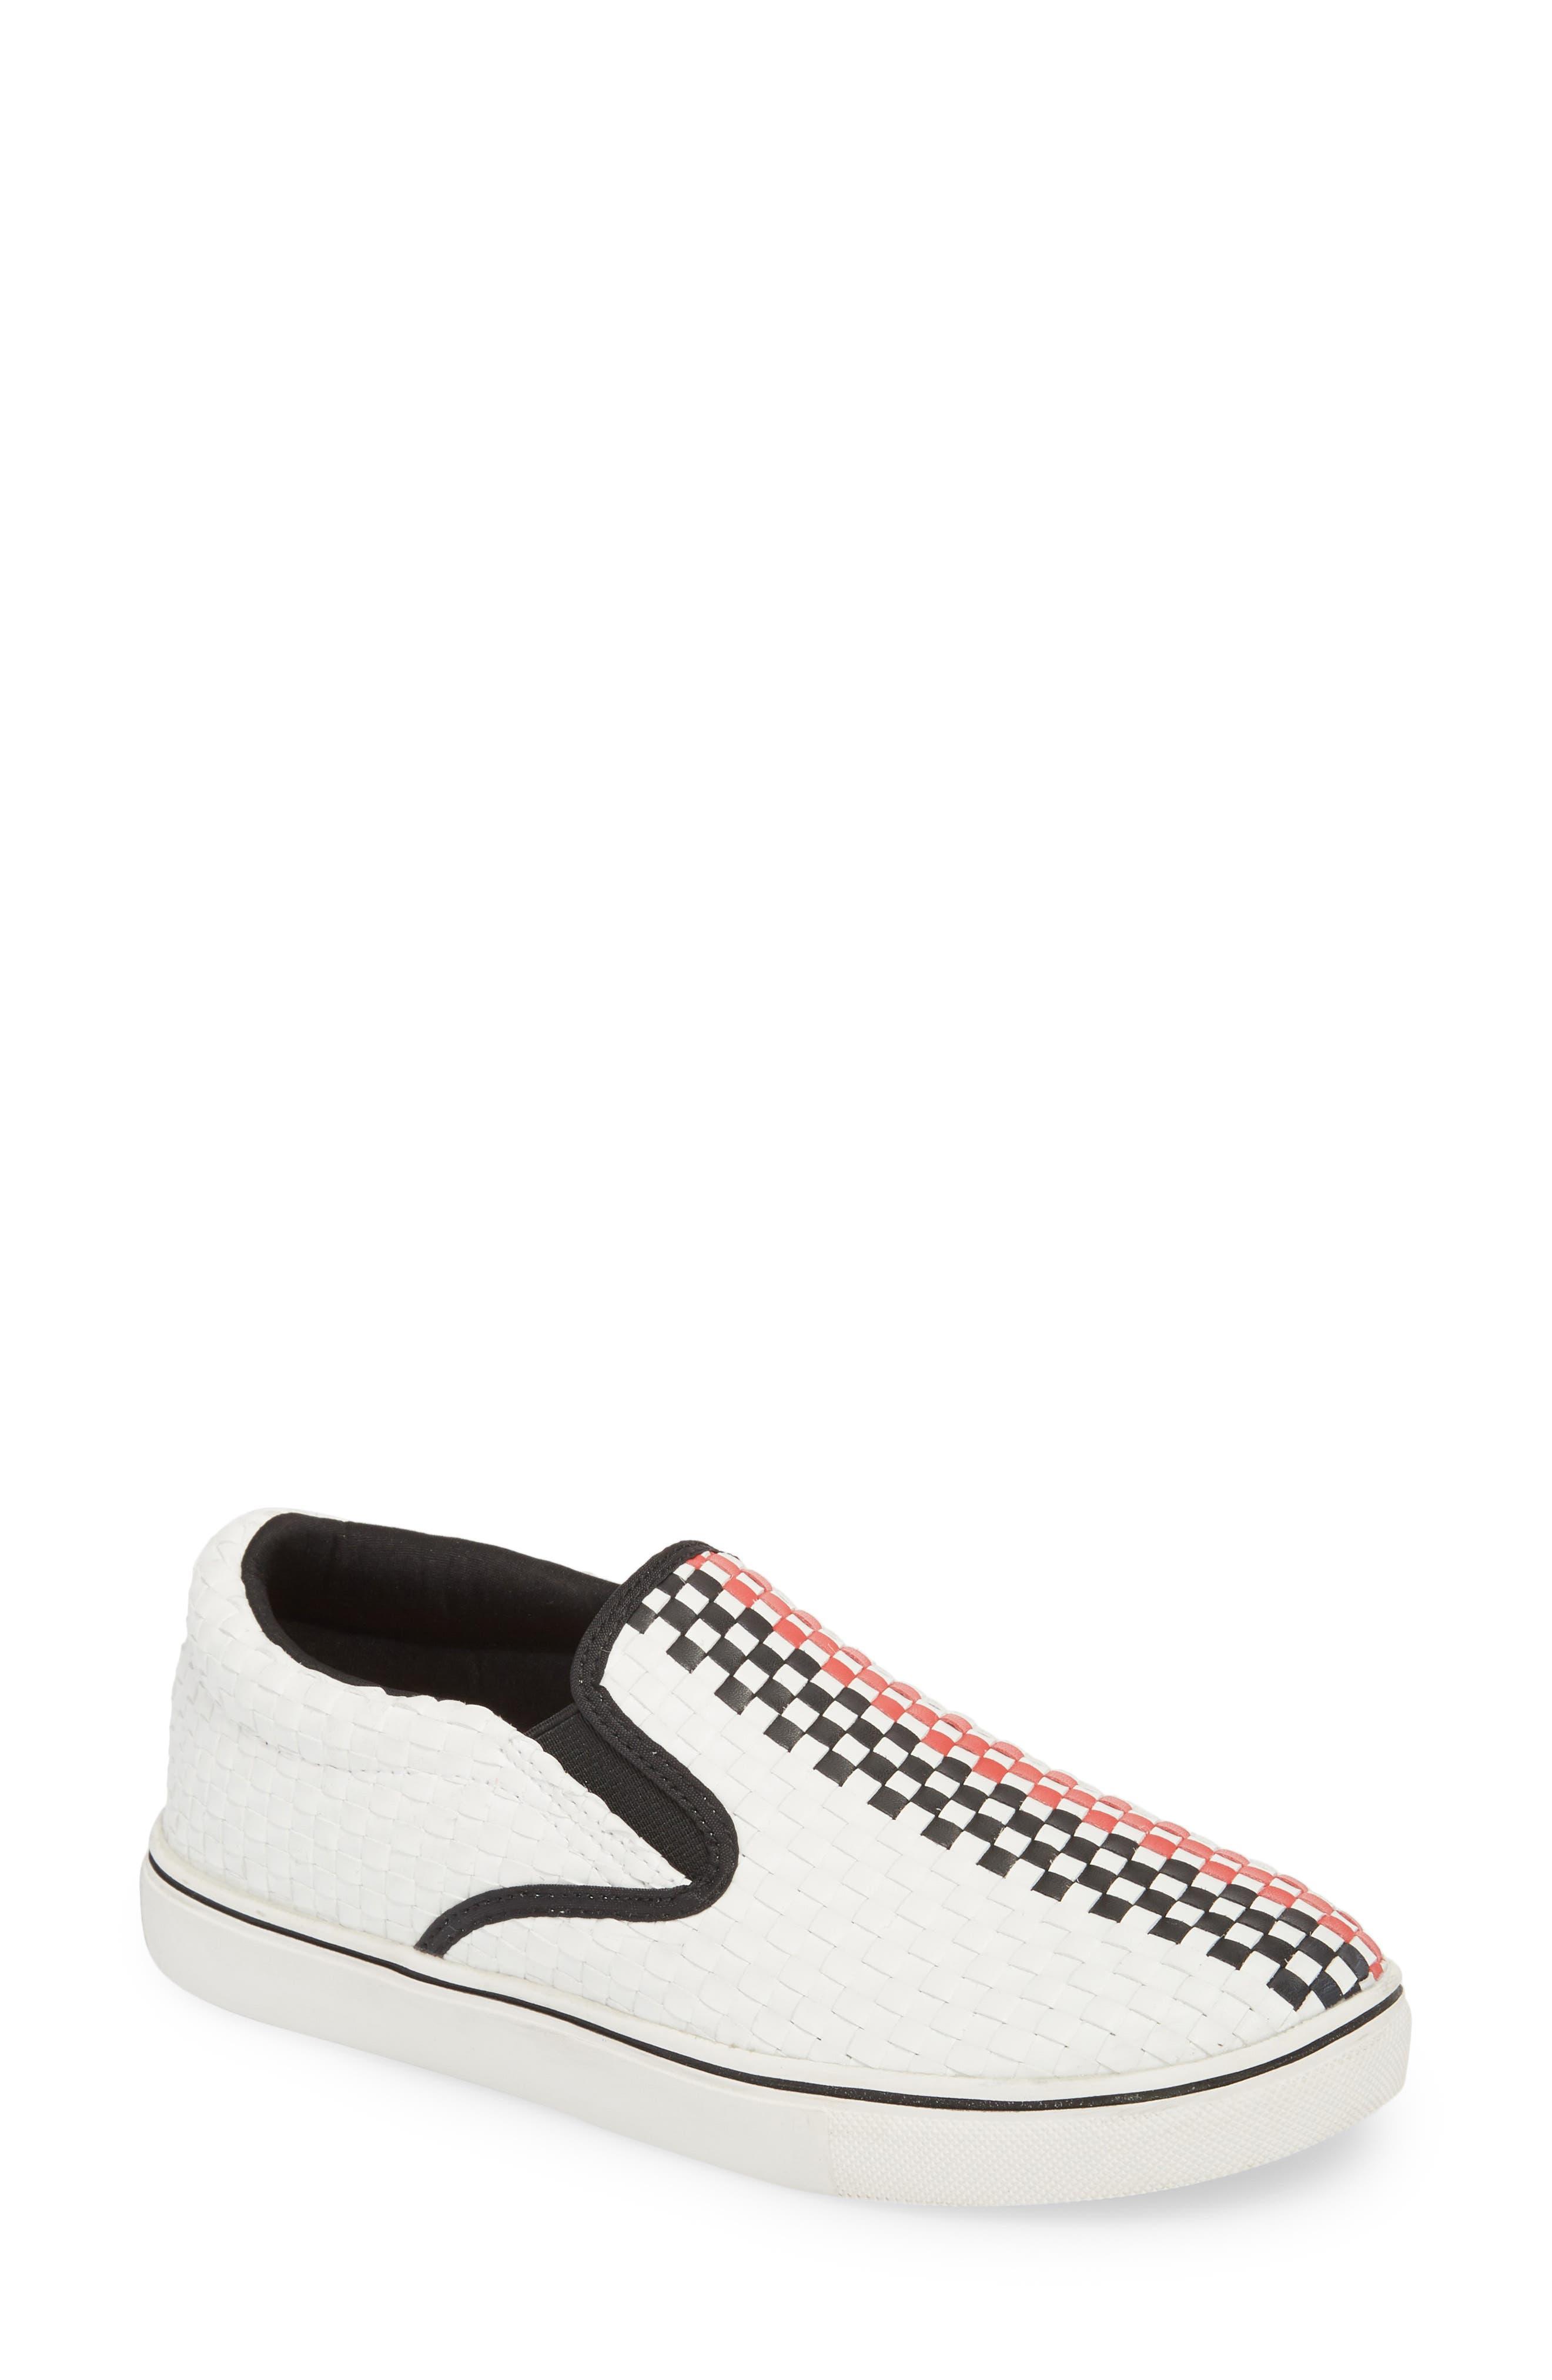 Checkerboard Slip-On Sneaker,                         Main,                         color, White/ Red/ Black